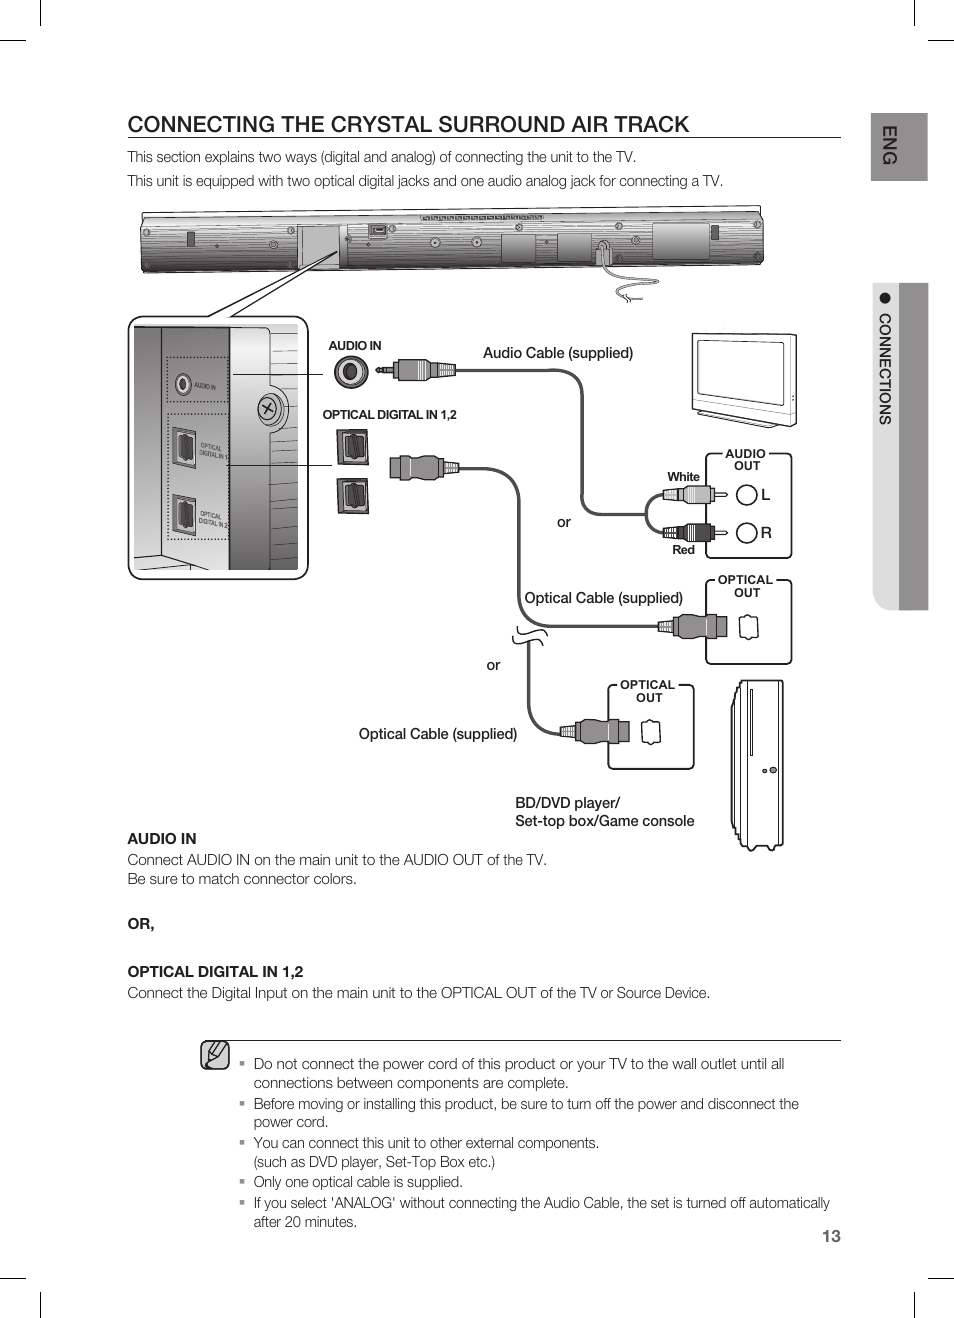 Samsung smart tv user manual